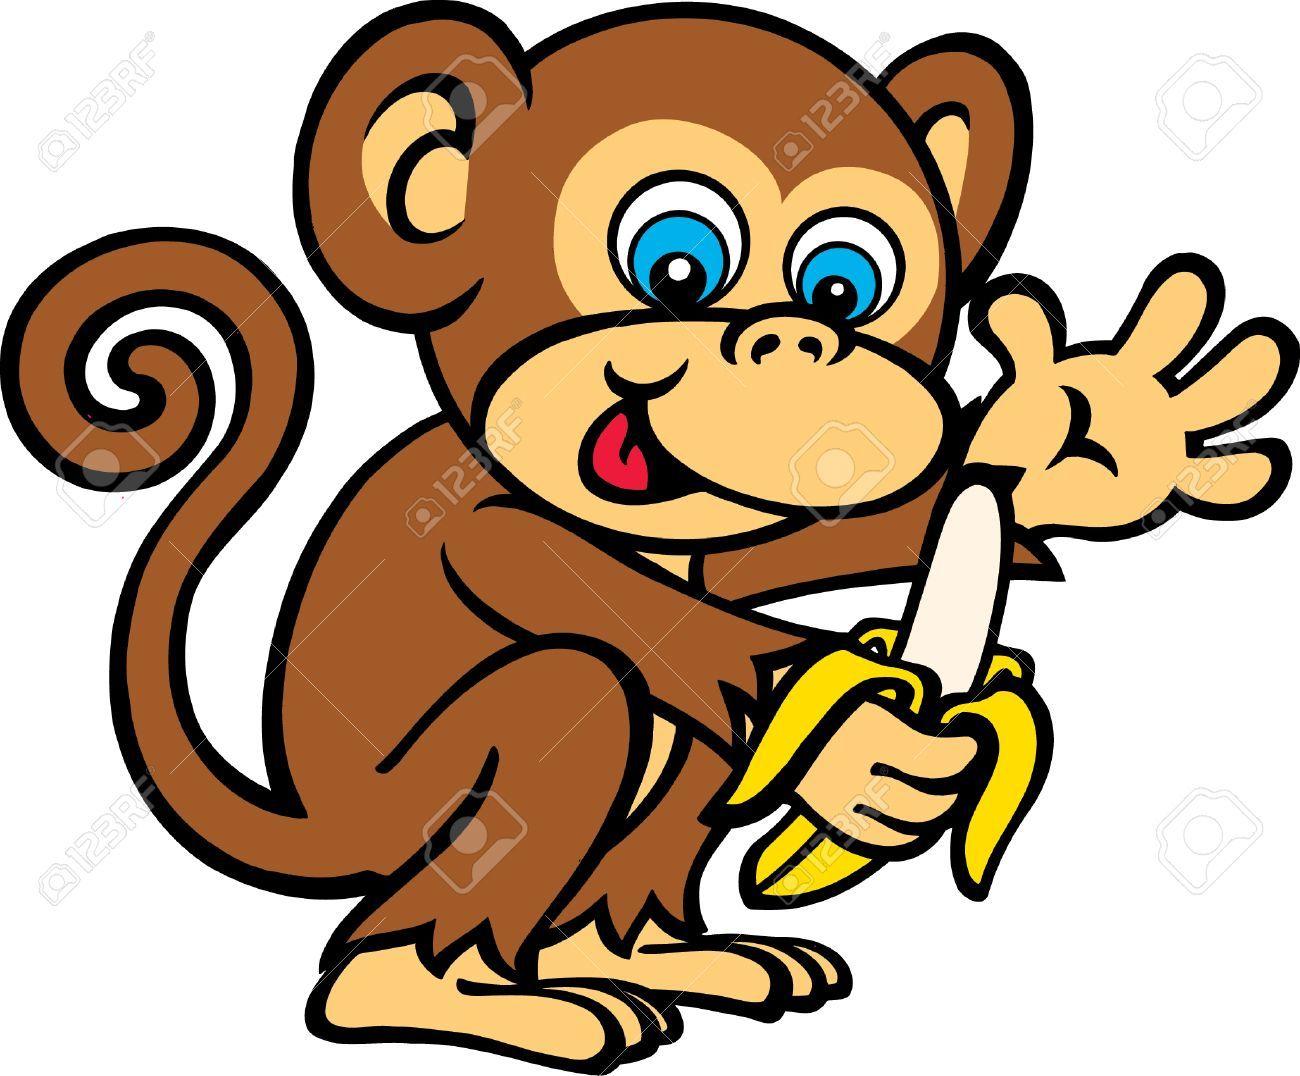 Monkey eating banana clipart 8 » Clipart Portal.